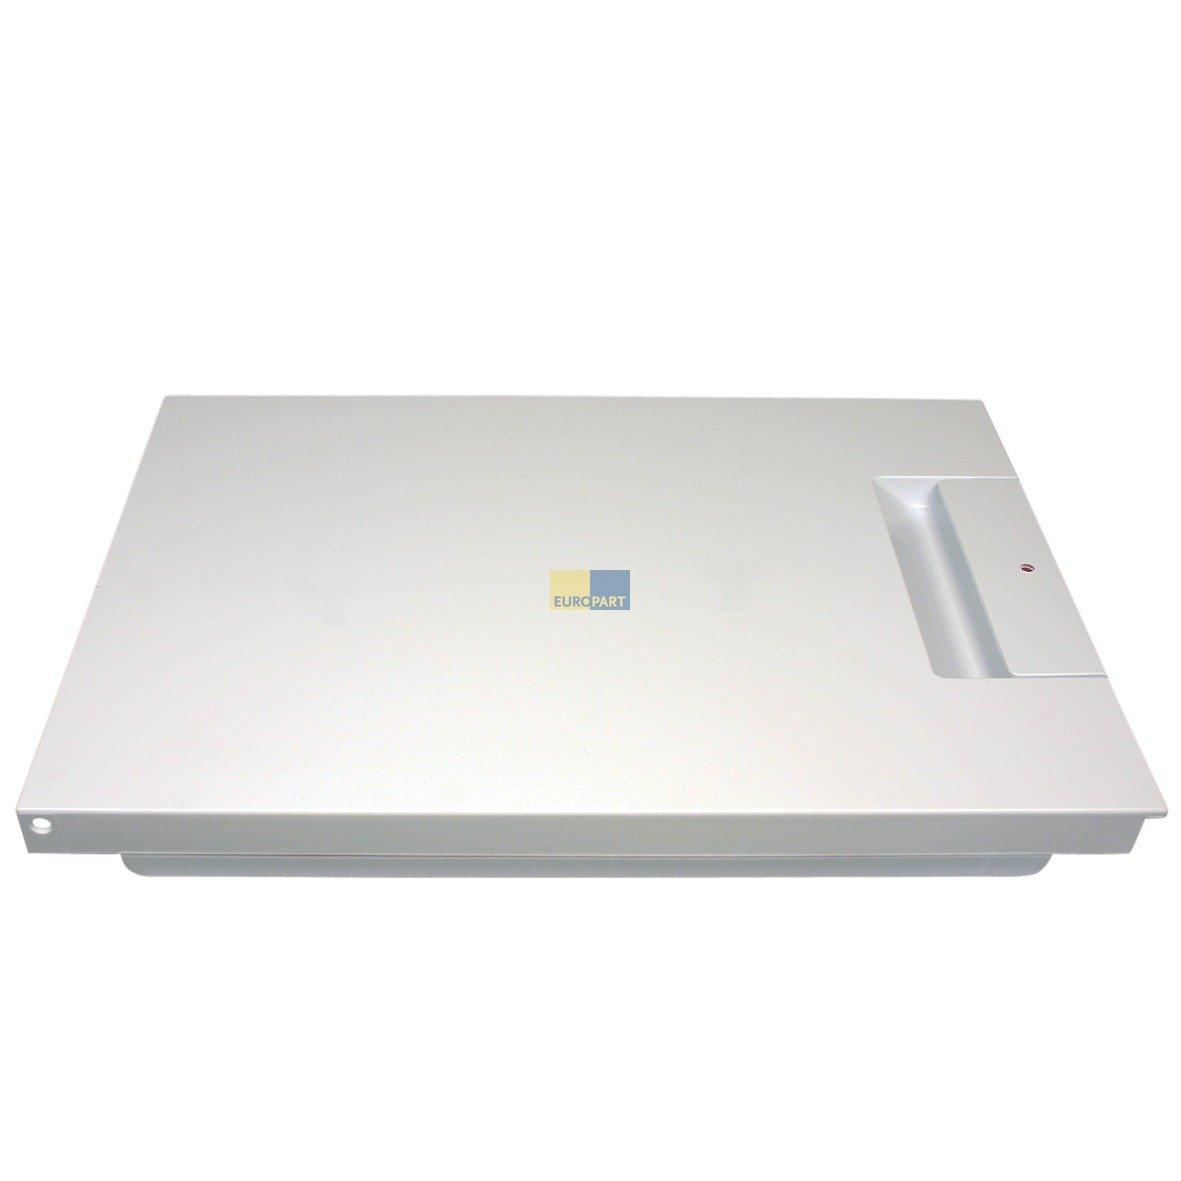 Bosch Neff Siemens Refrigeration Crisper Cover Slide Flap GENUINE FREE DELIVERY